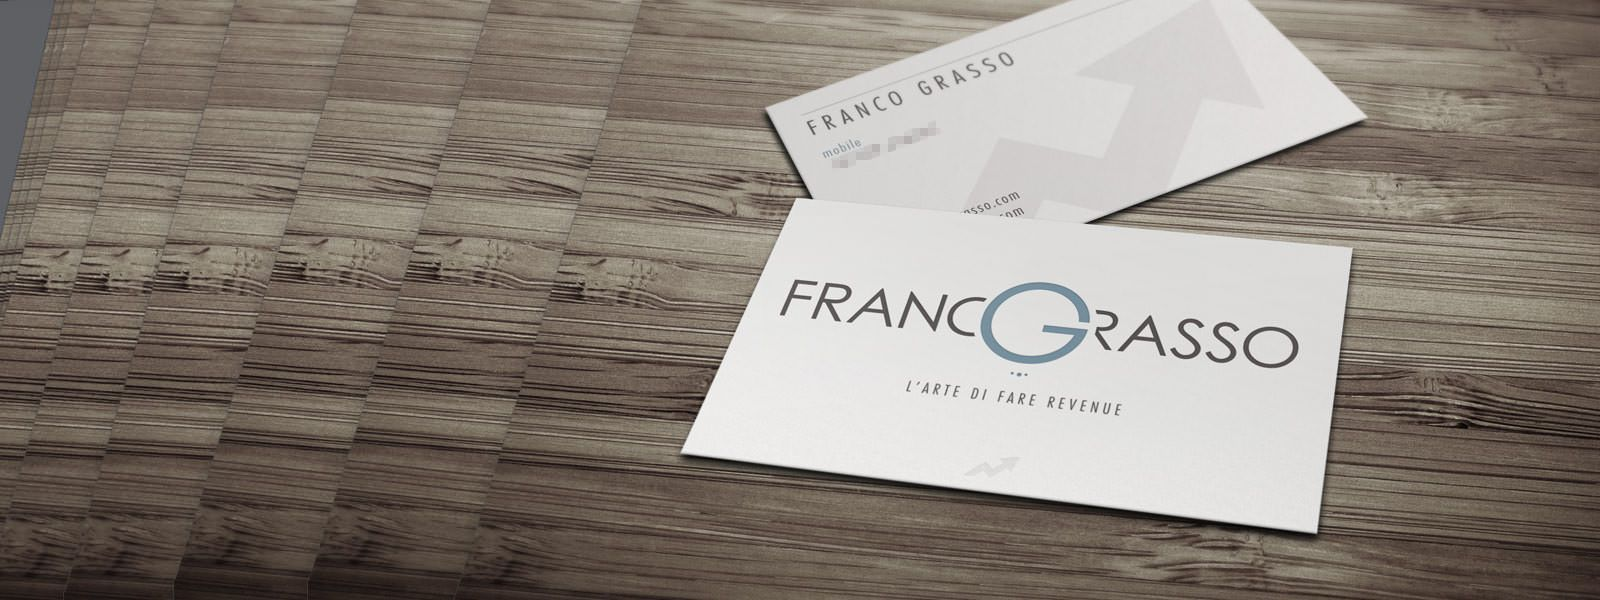 francograsso-brand